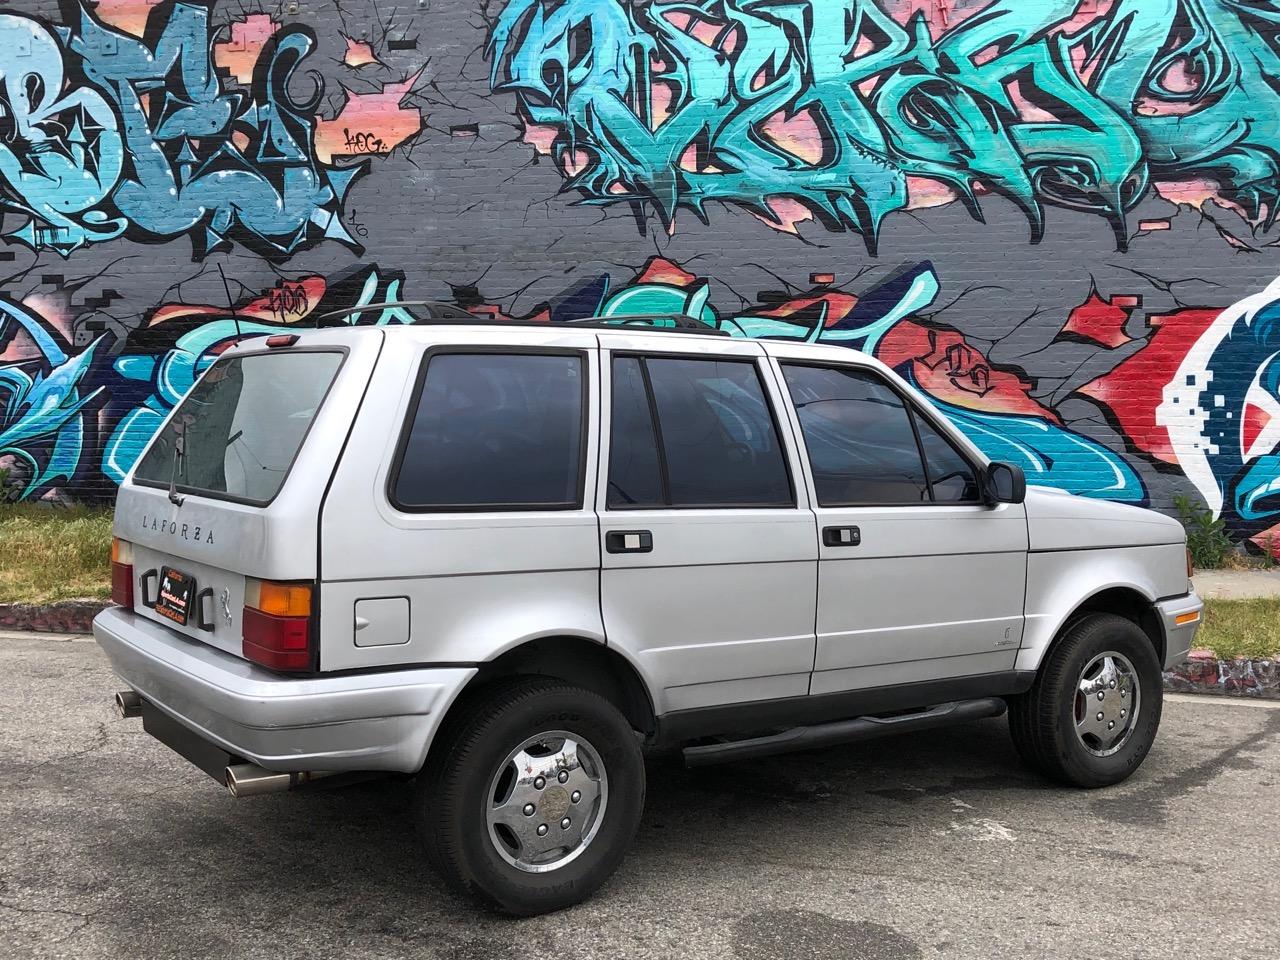 Used 1989 Laforza 50 4X4